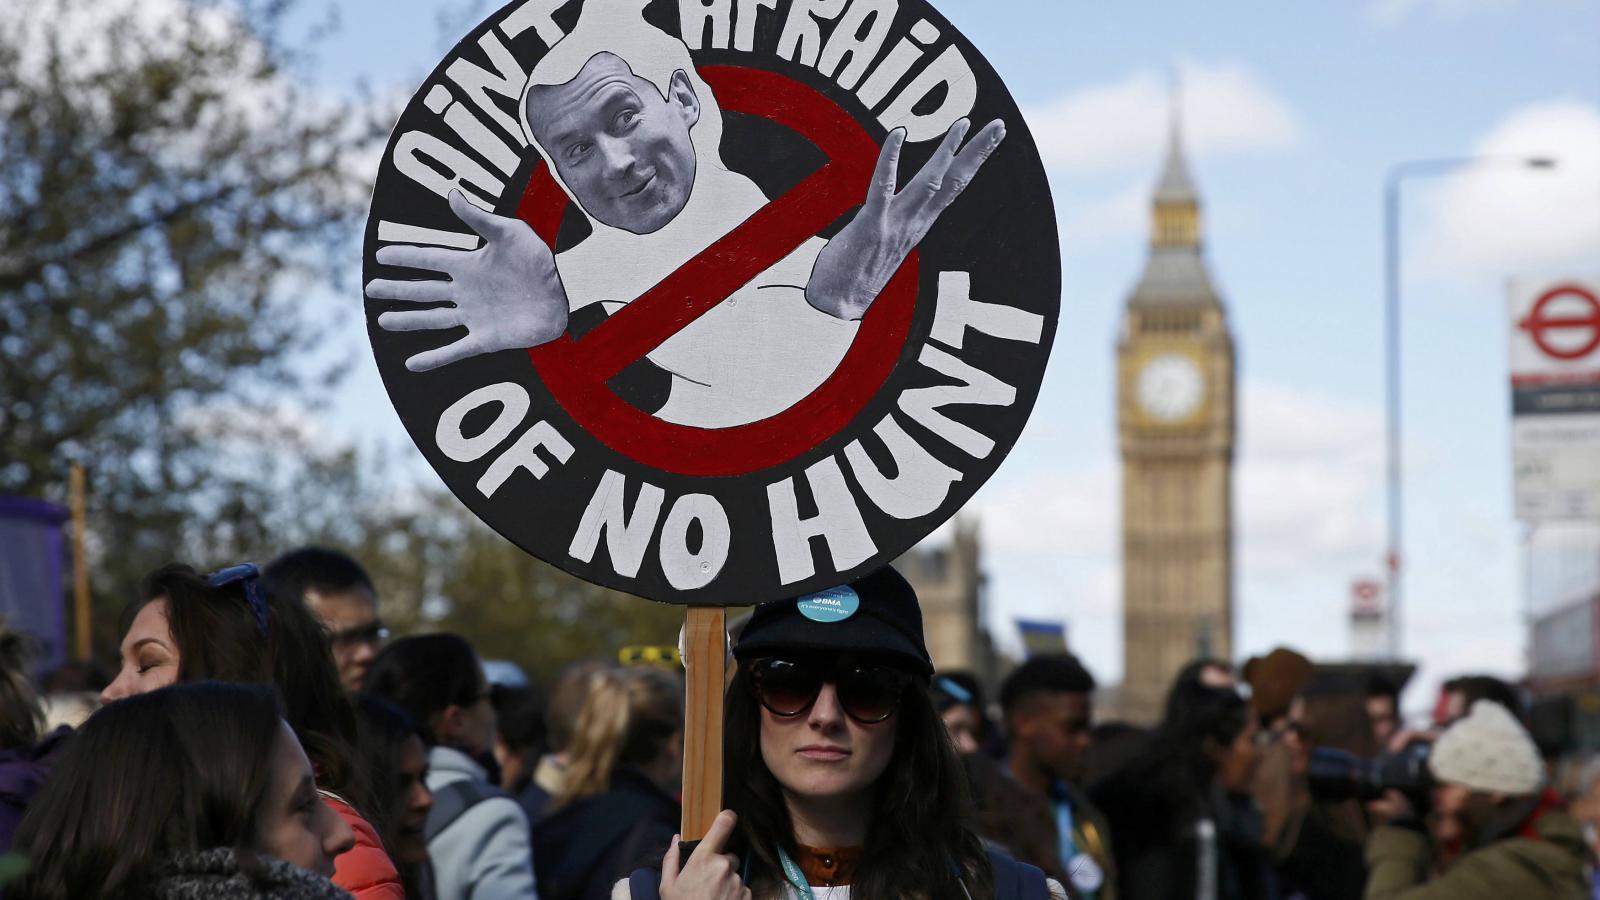 Stávka mladých lékařů v Británii